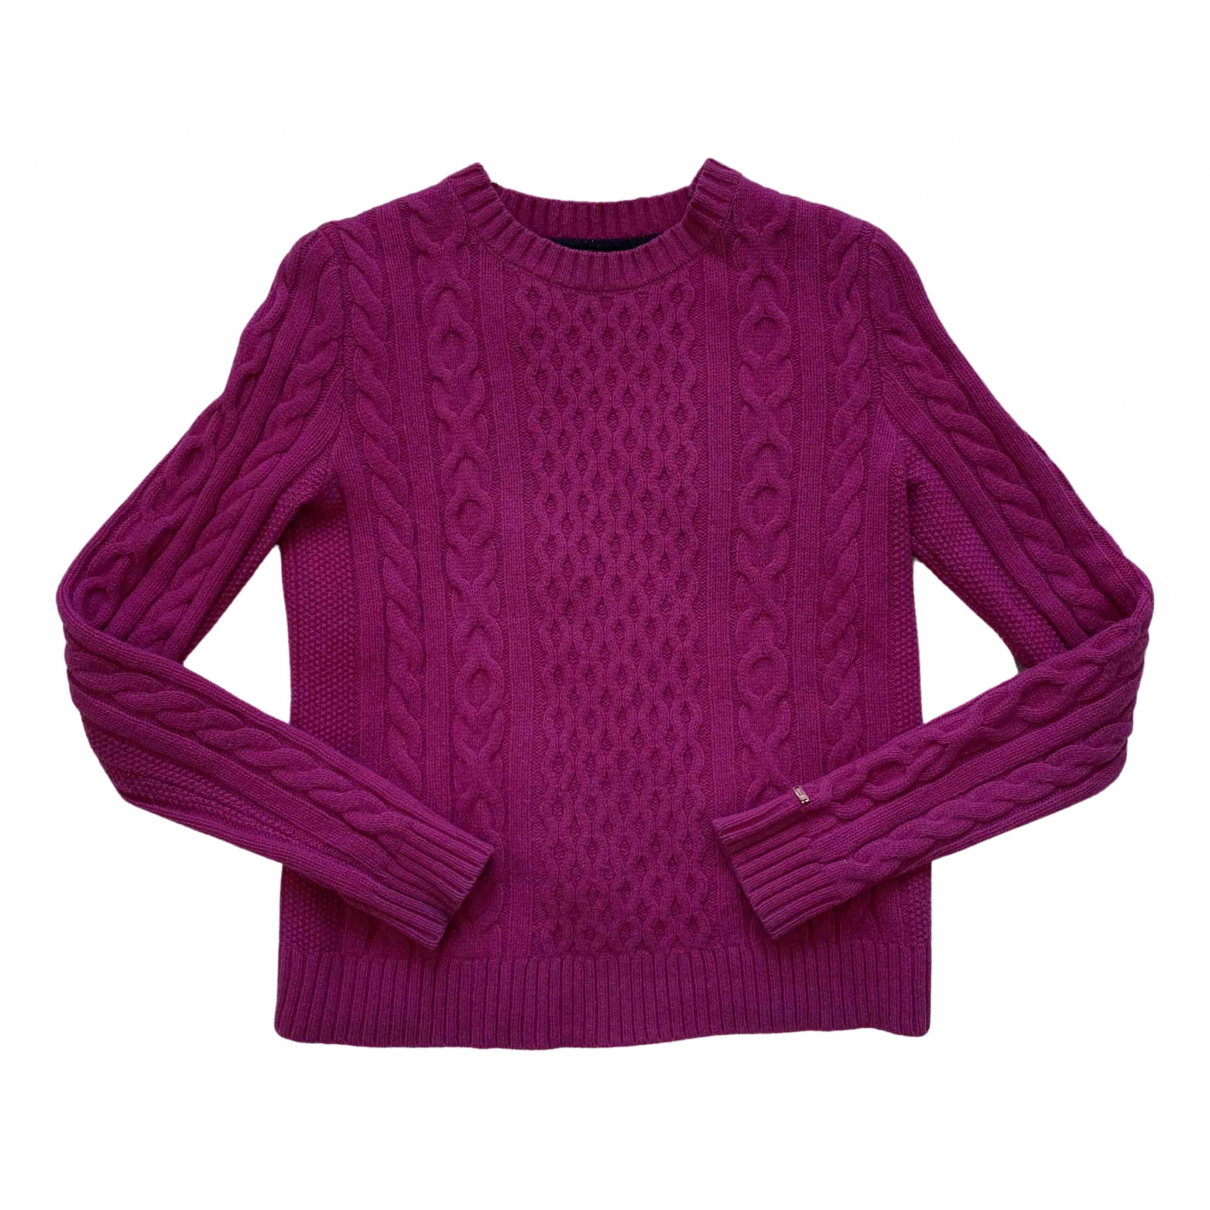 Tommy Hilfiger - Pull   pour femme en cachemire - violet